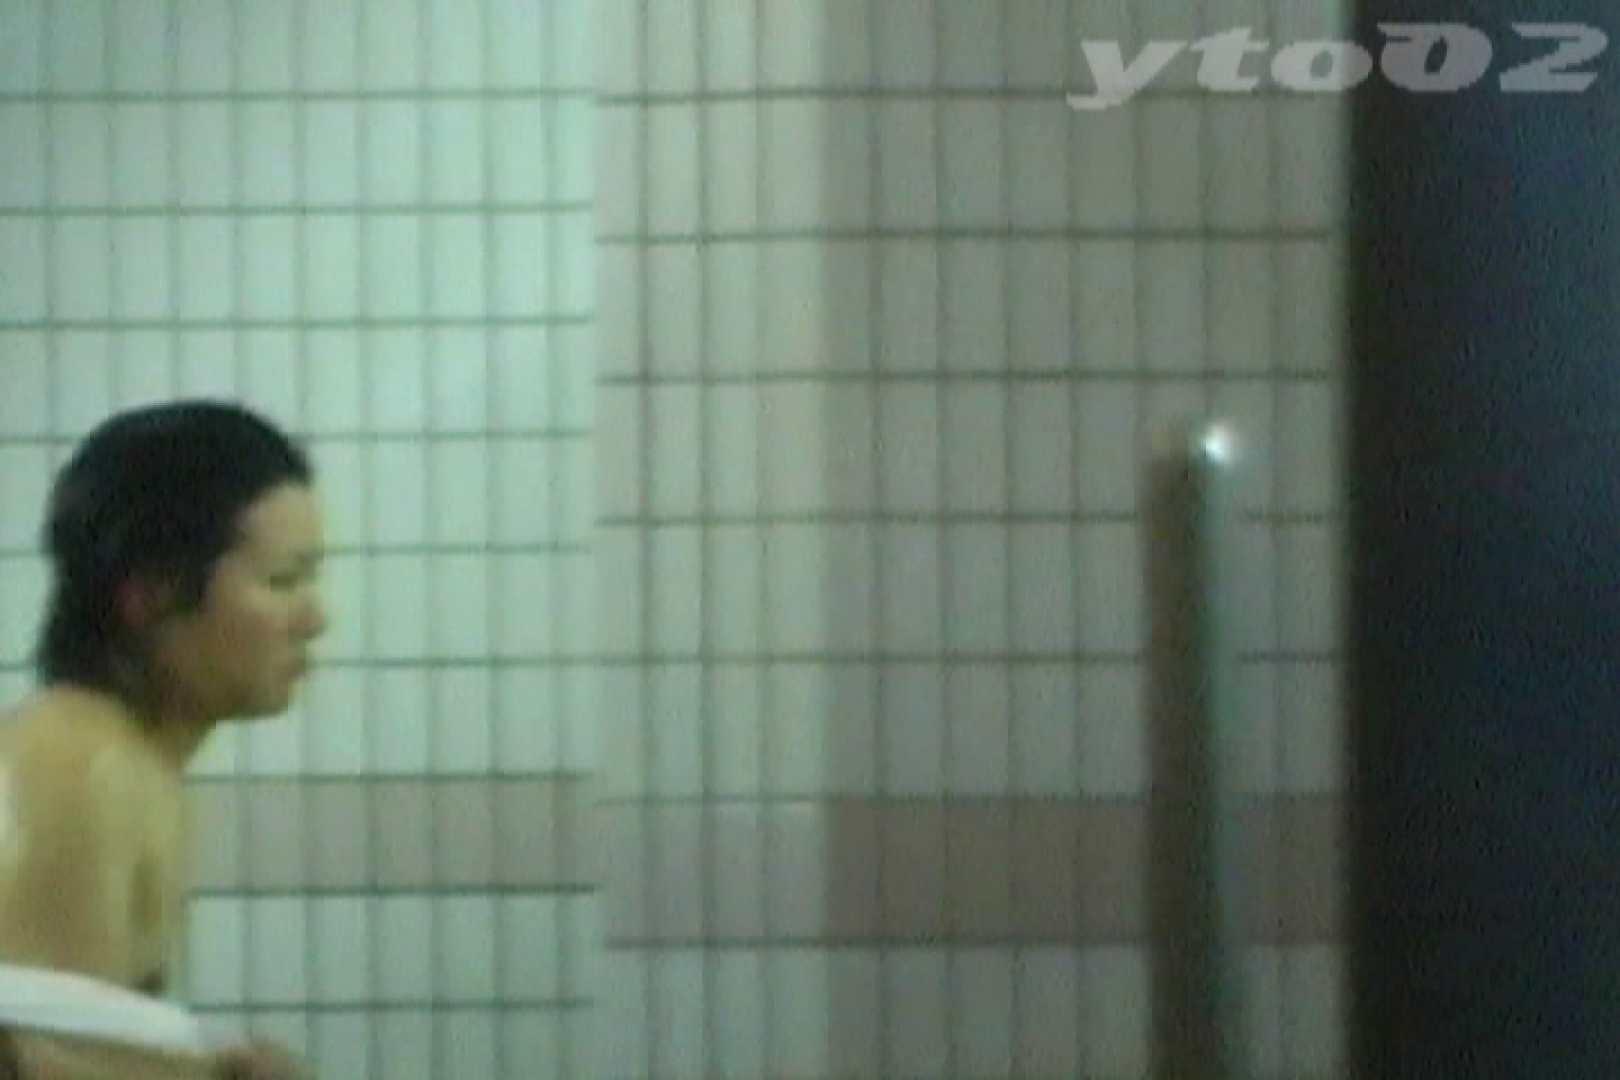 ▲復活限定▲合宿ホテル女風呂盗撮 Vol.14 名作 戯れ無修正画像 95画像 55